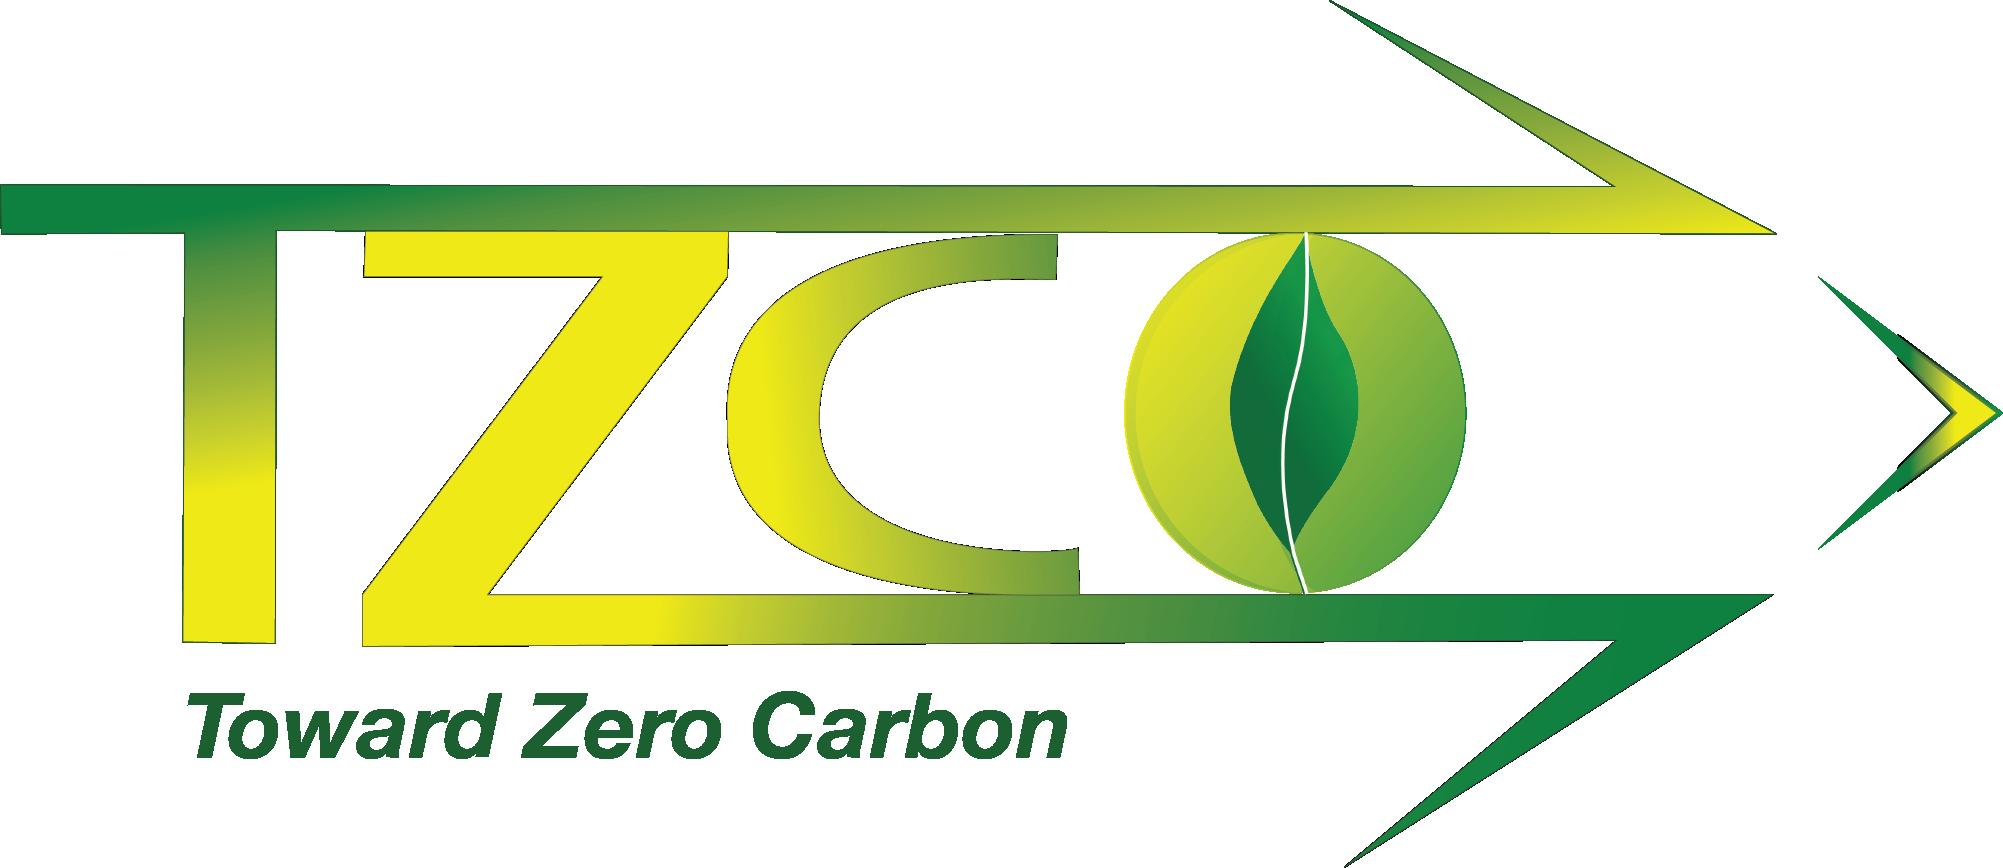 Toward Zero Carbon